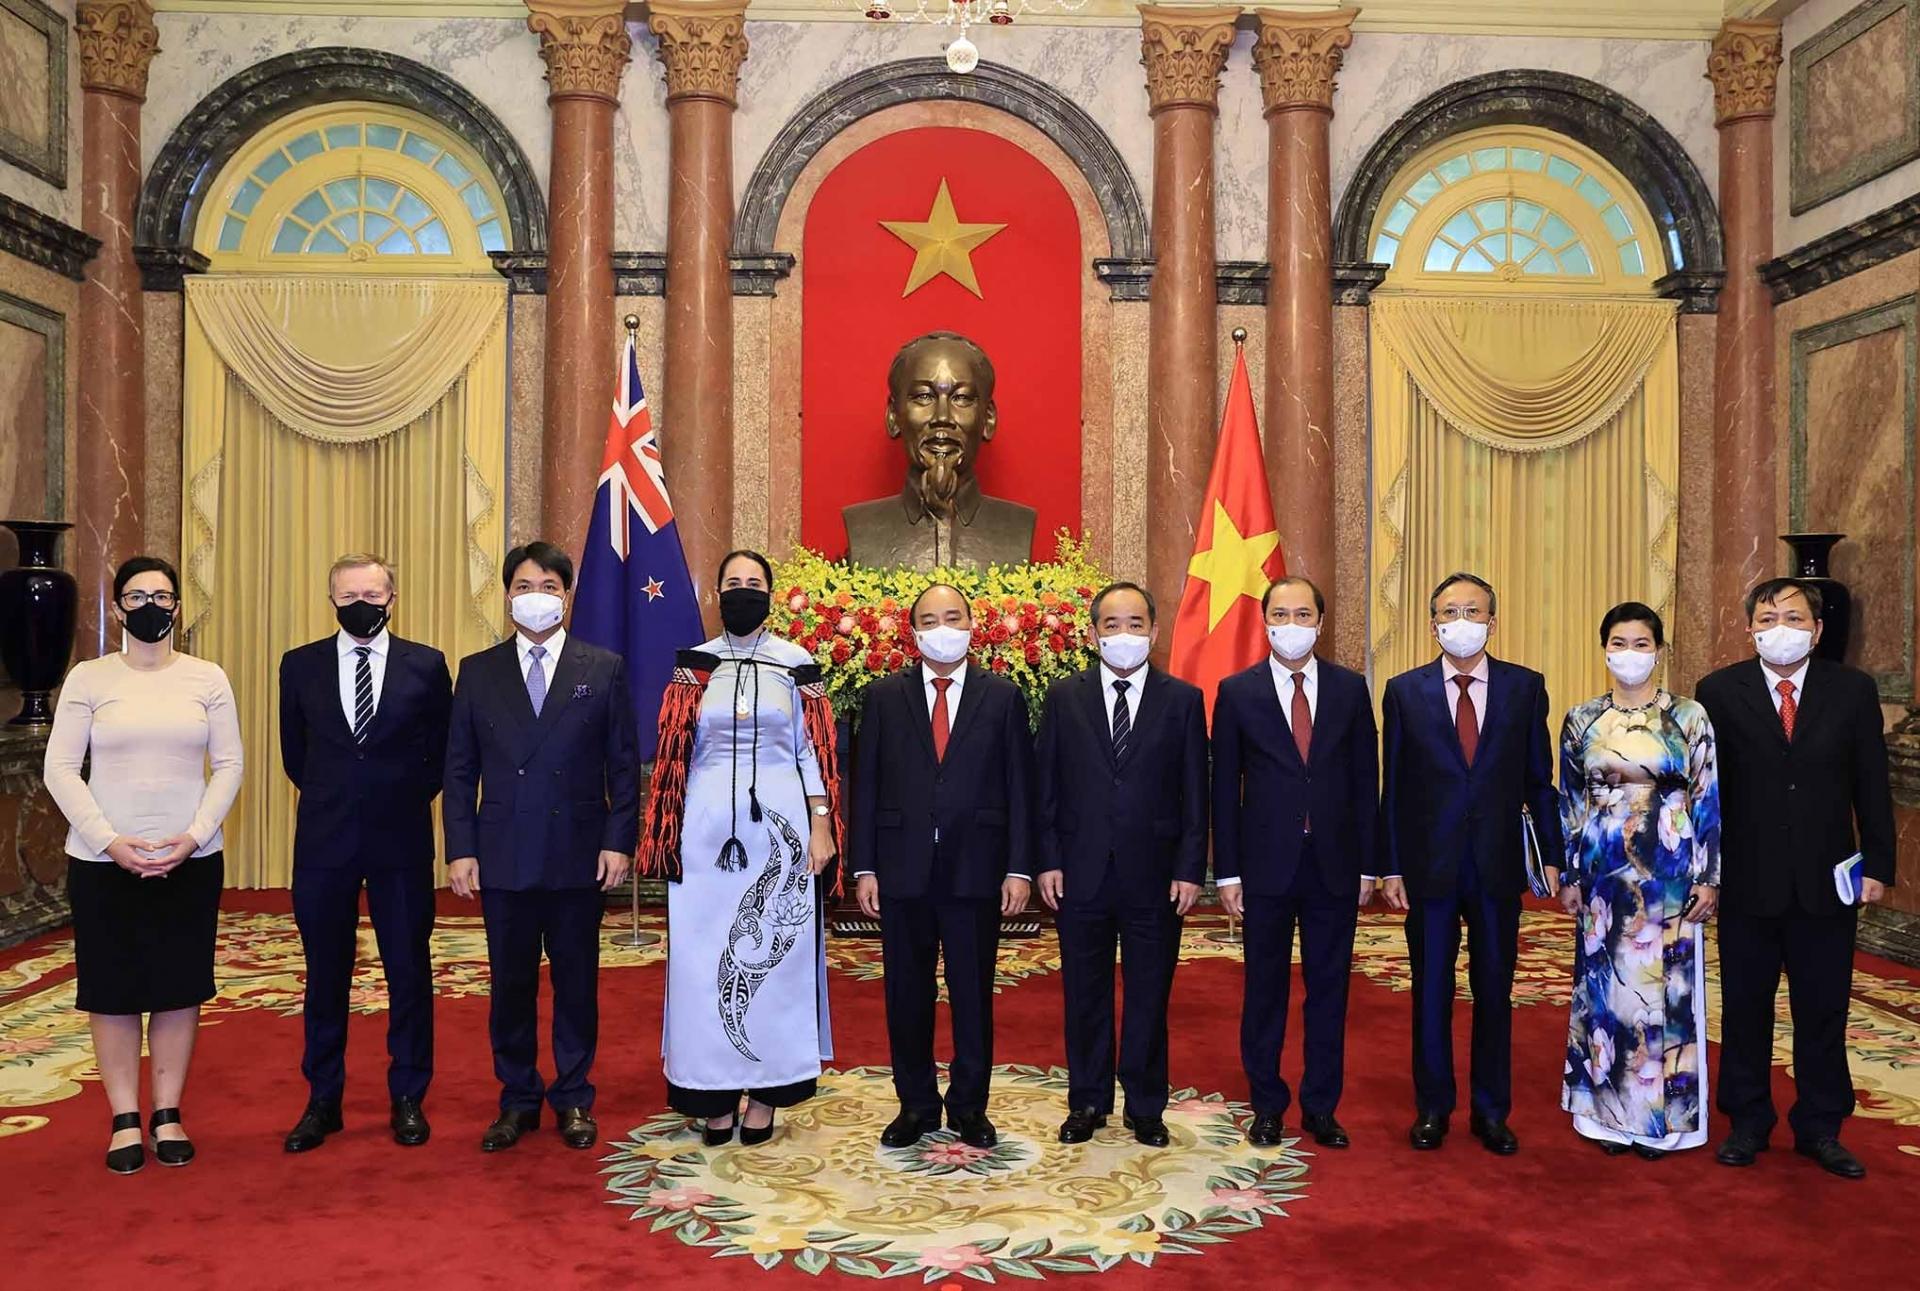 Ambassador's ao dai showcases Vietnamese and New Zealand cultural connections